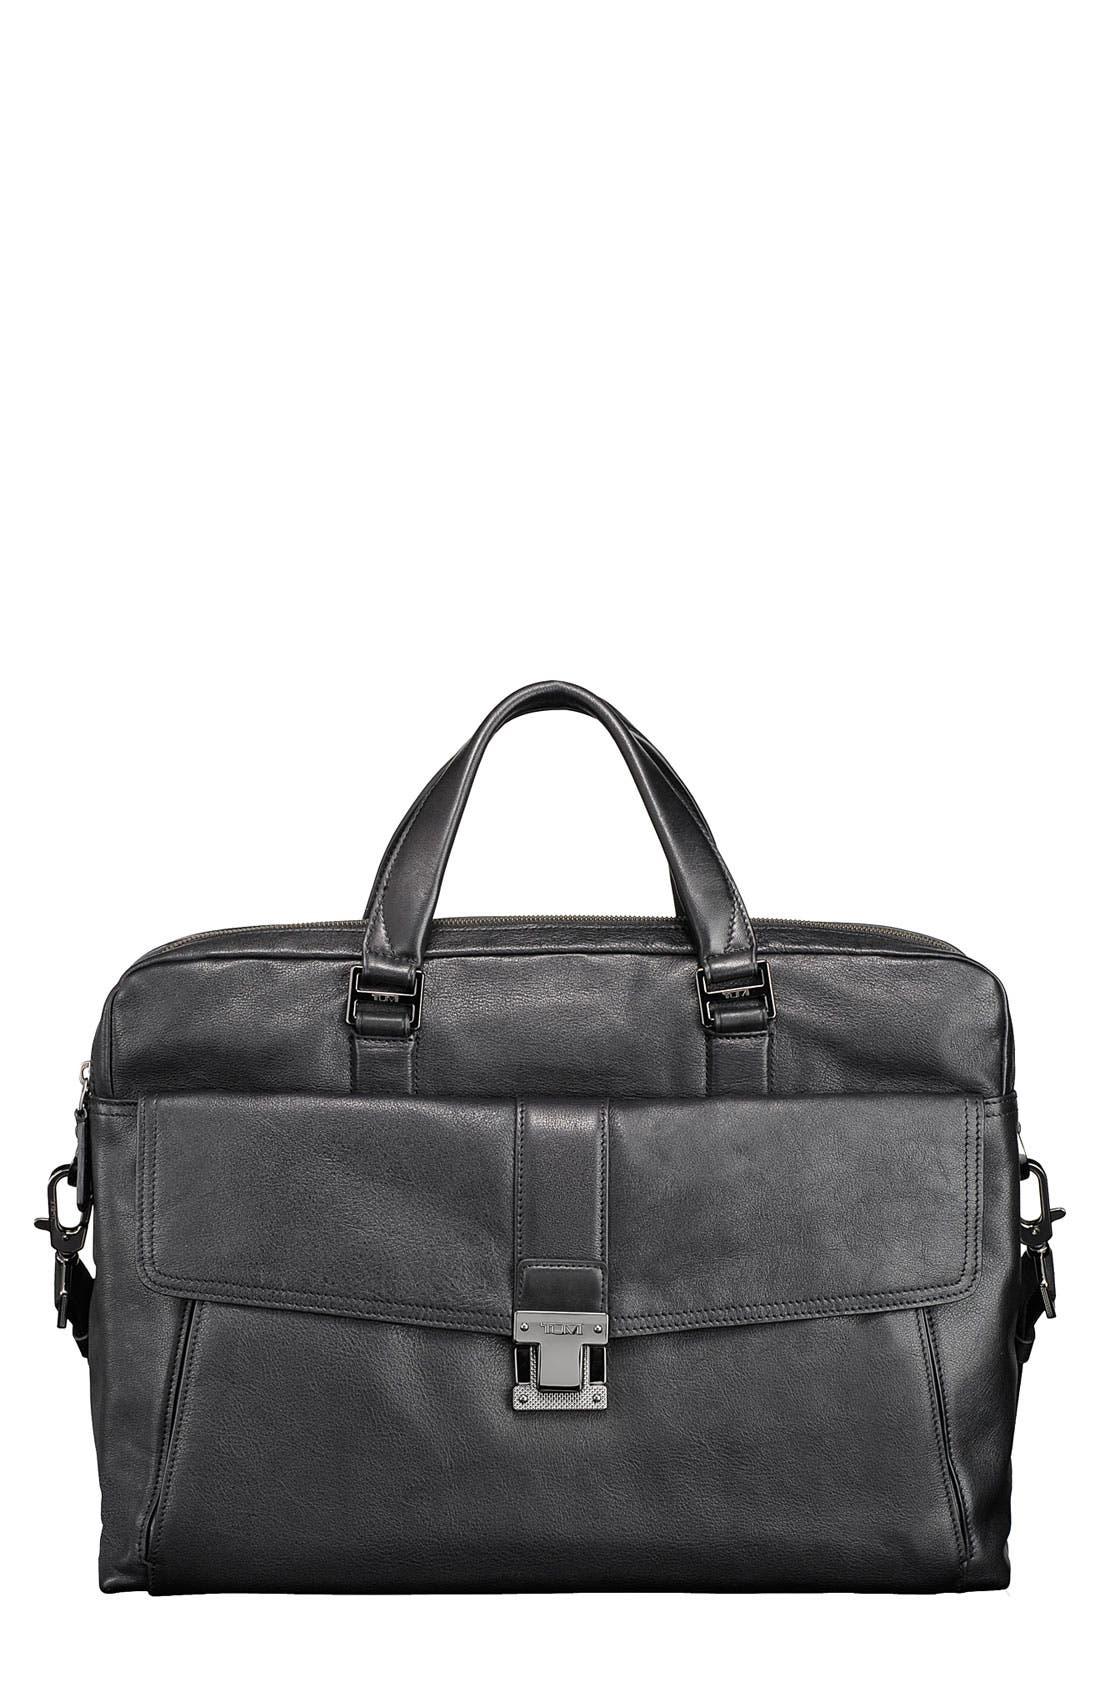 Main Image - Tumi 'Beacon Hill - Chestnut Large' Laptop Briefcase